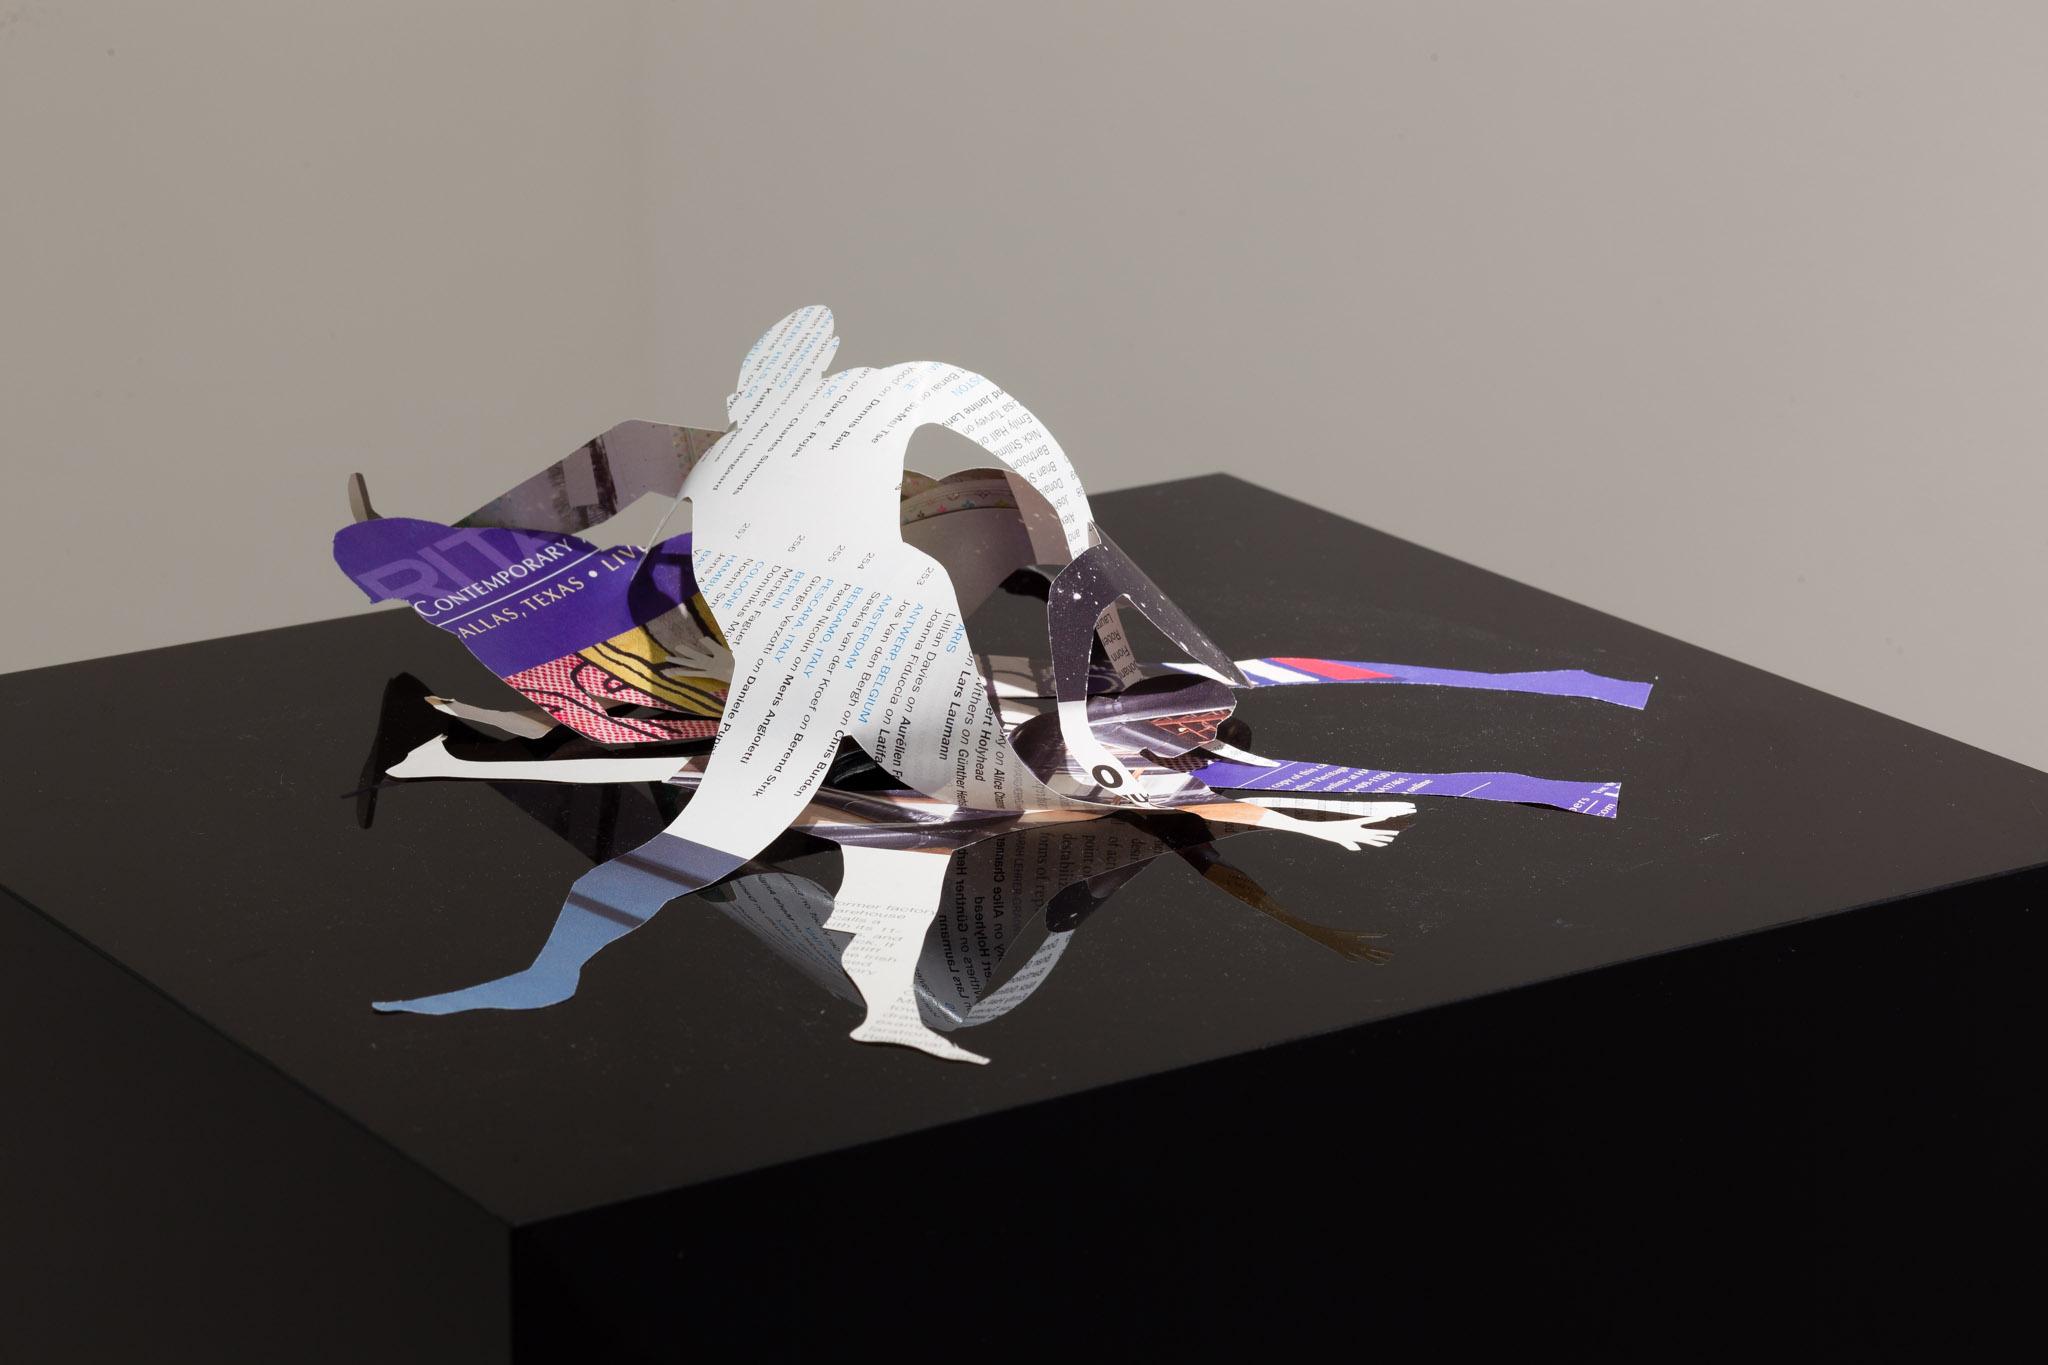 Exhibition view. Adriana Lara, Josef Strau & Perros Negros